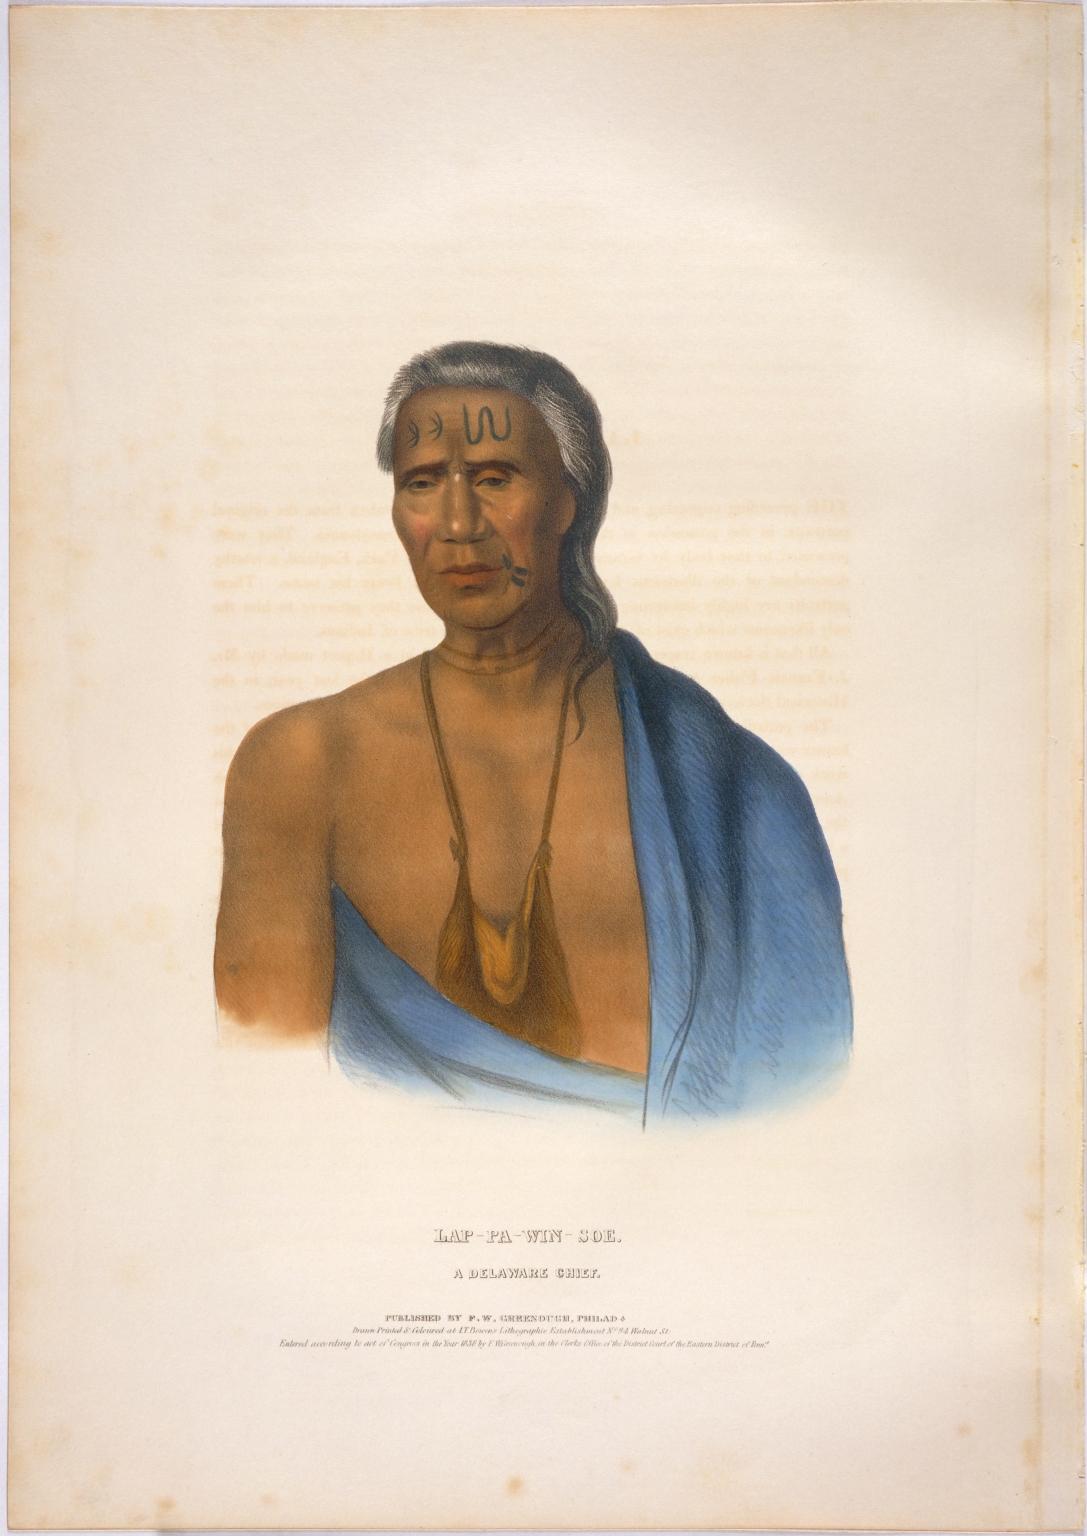 Lap-pa-win-soe, a Delaware chief